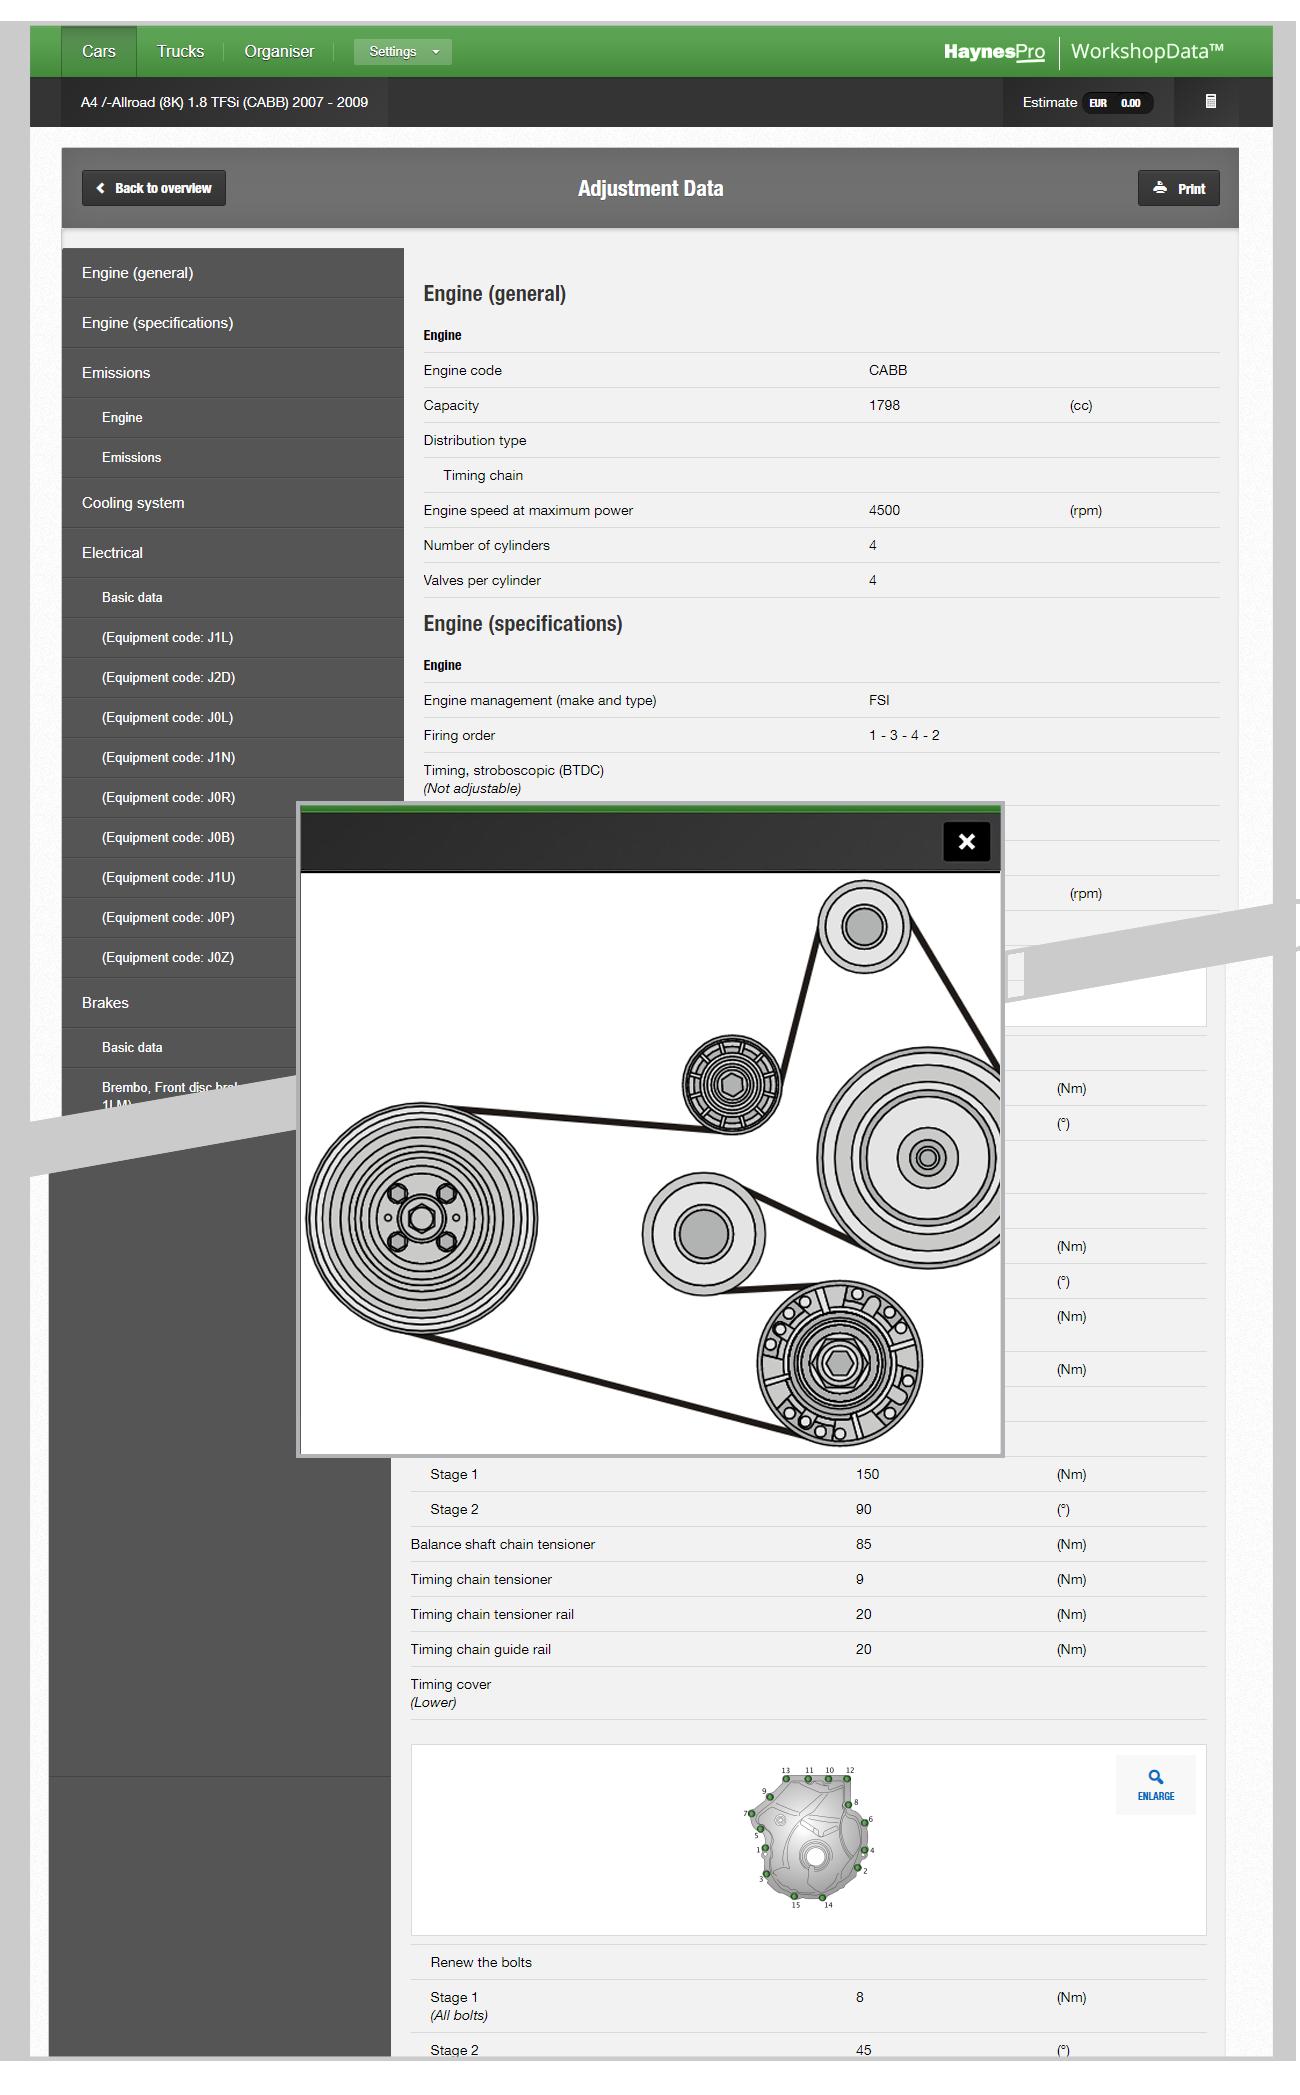 car_tech_adjustment_data_0